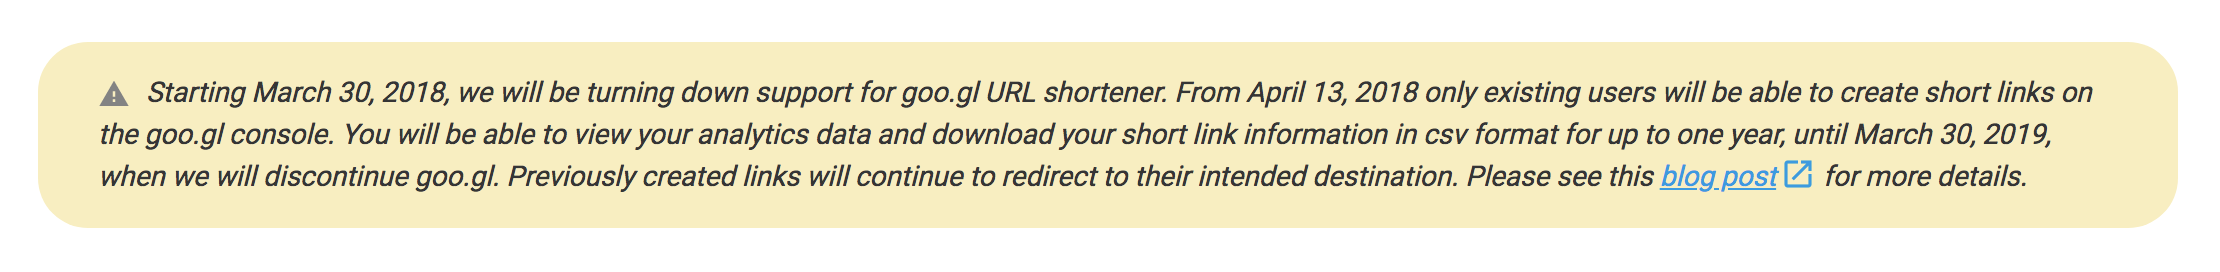 Goo.gl URL Shortener Service Notice